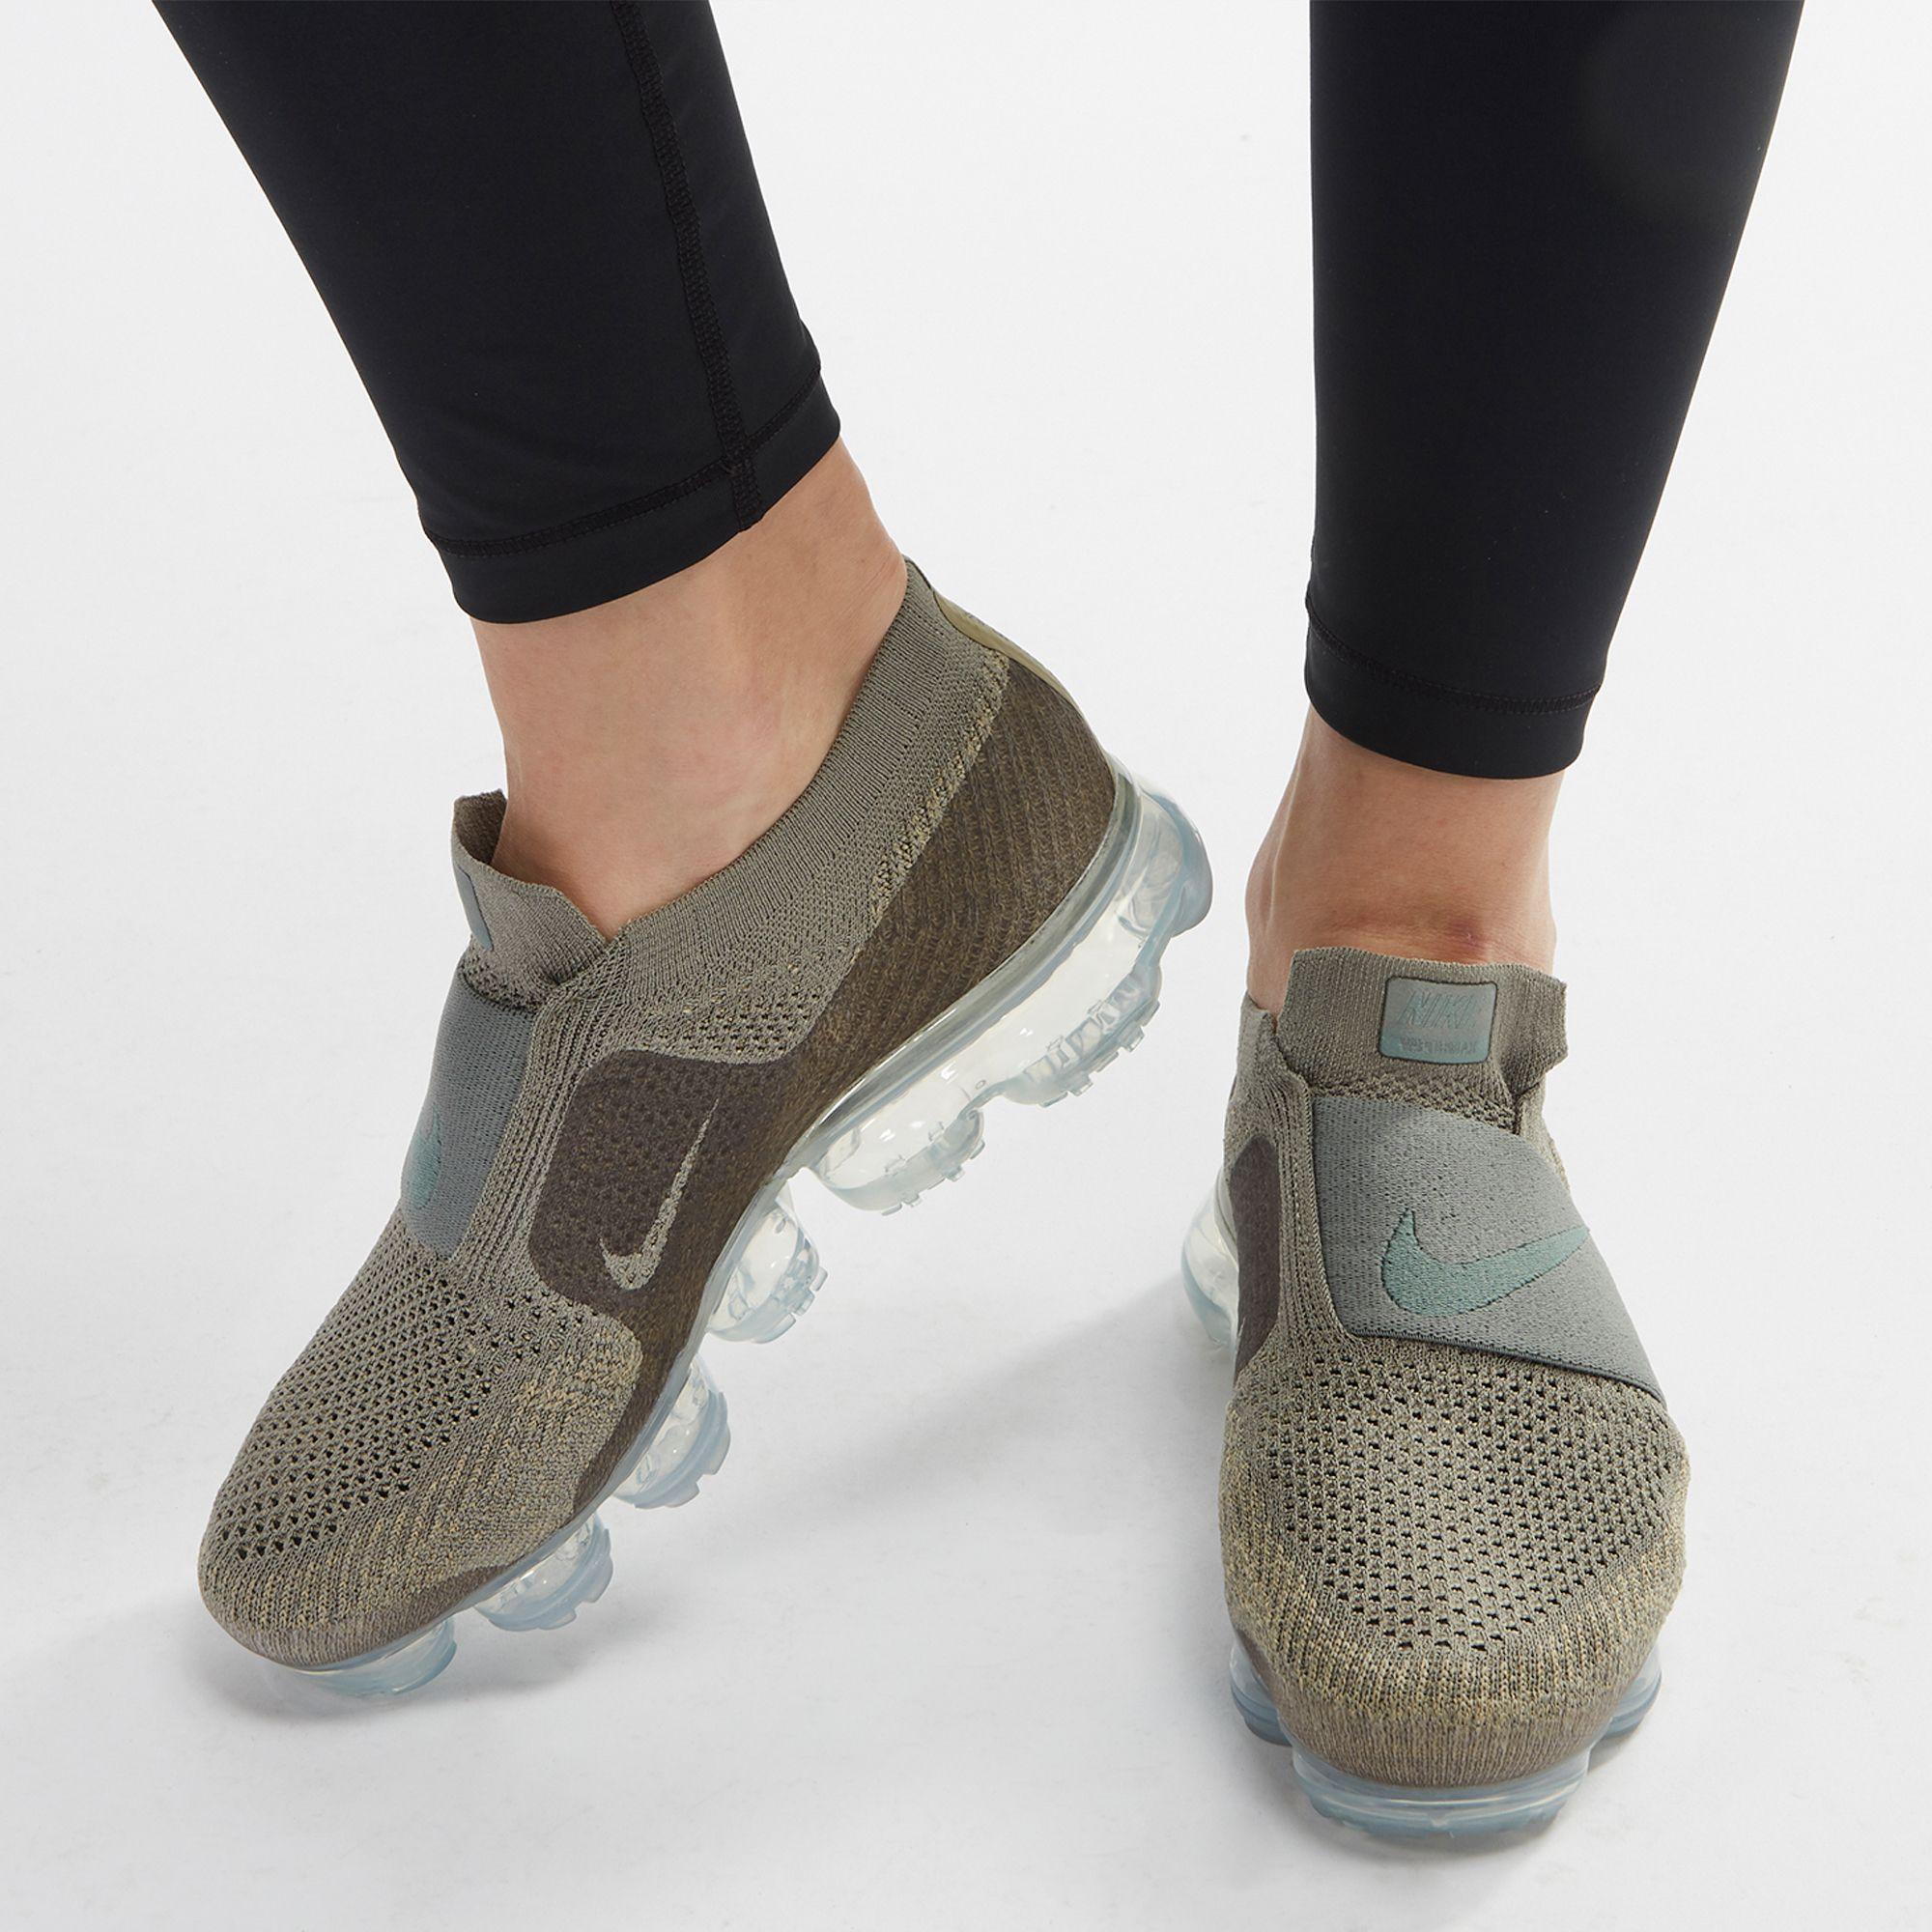 buy popular b6f3d 598ee Shop Green Nike Air VaporMax Flyknit Moc Running Shoe for ...